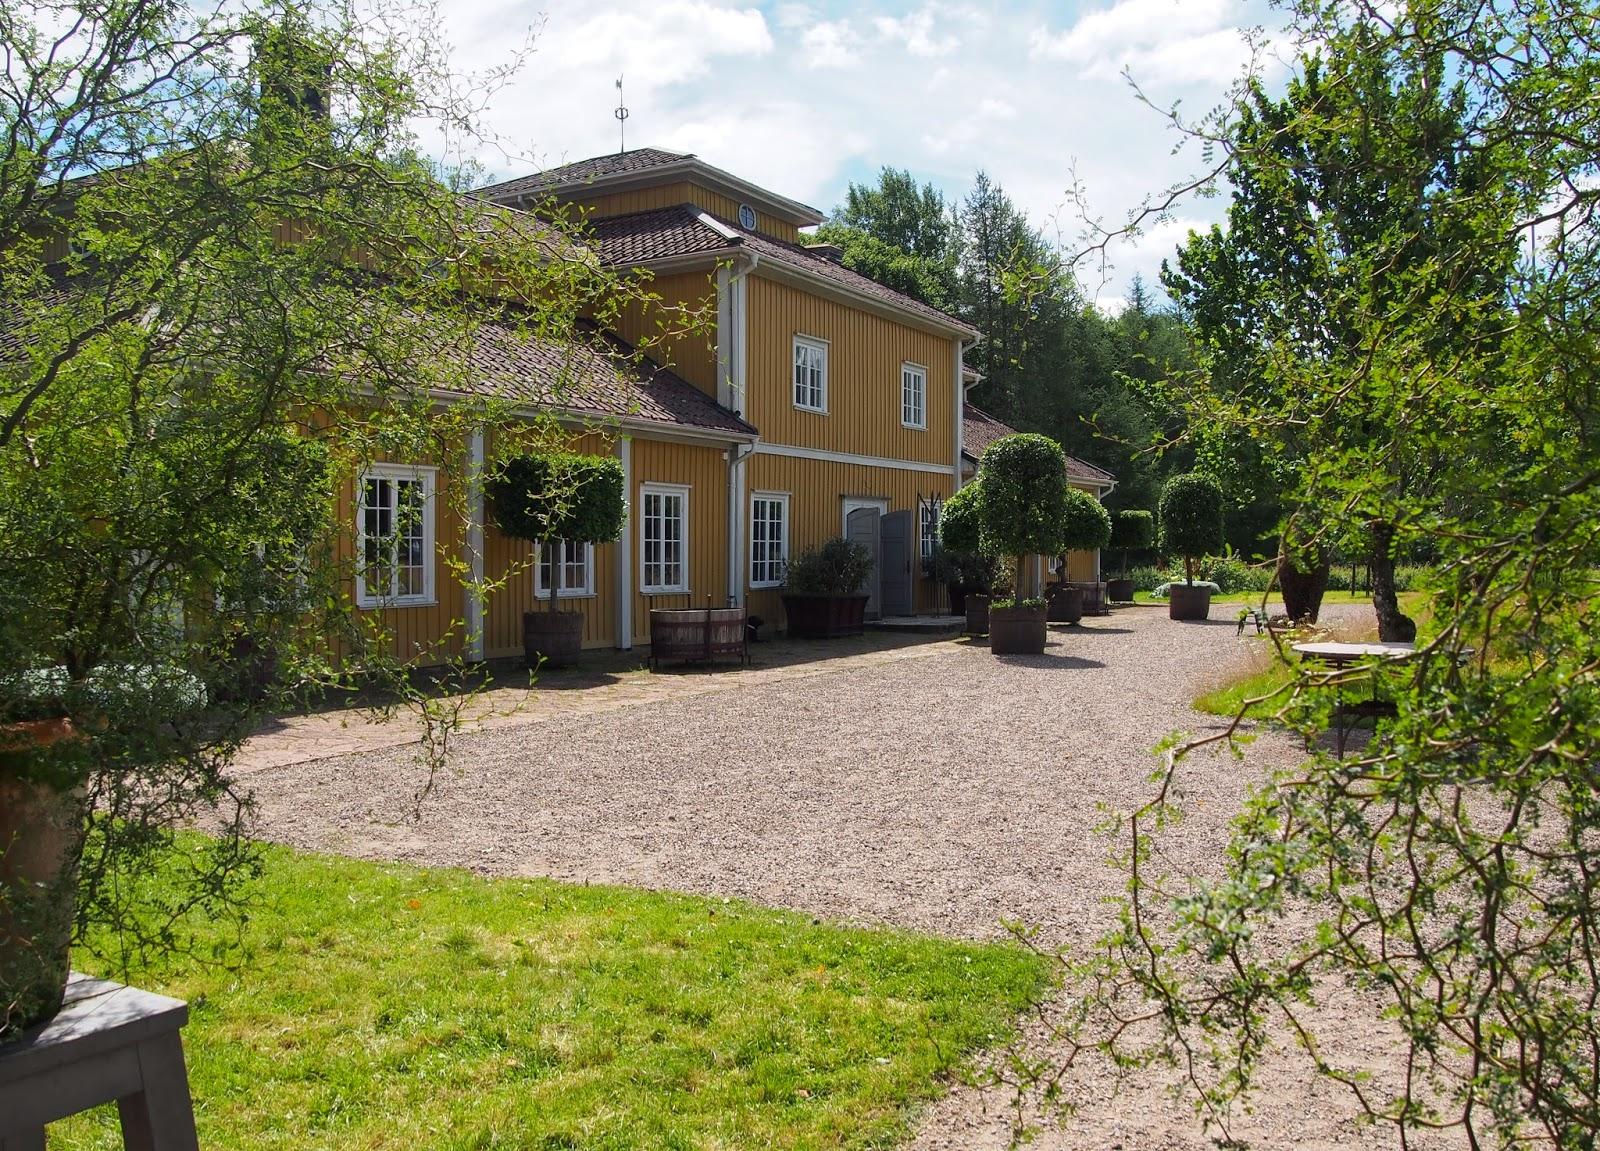 Tage Andersen's Gunillaberg in Sweden